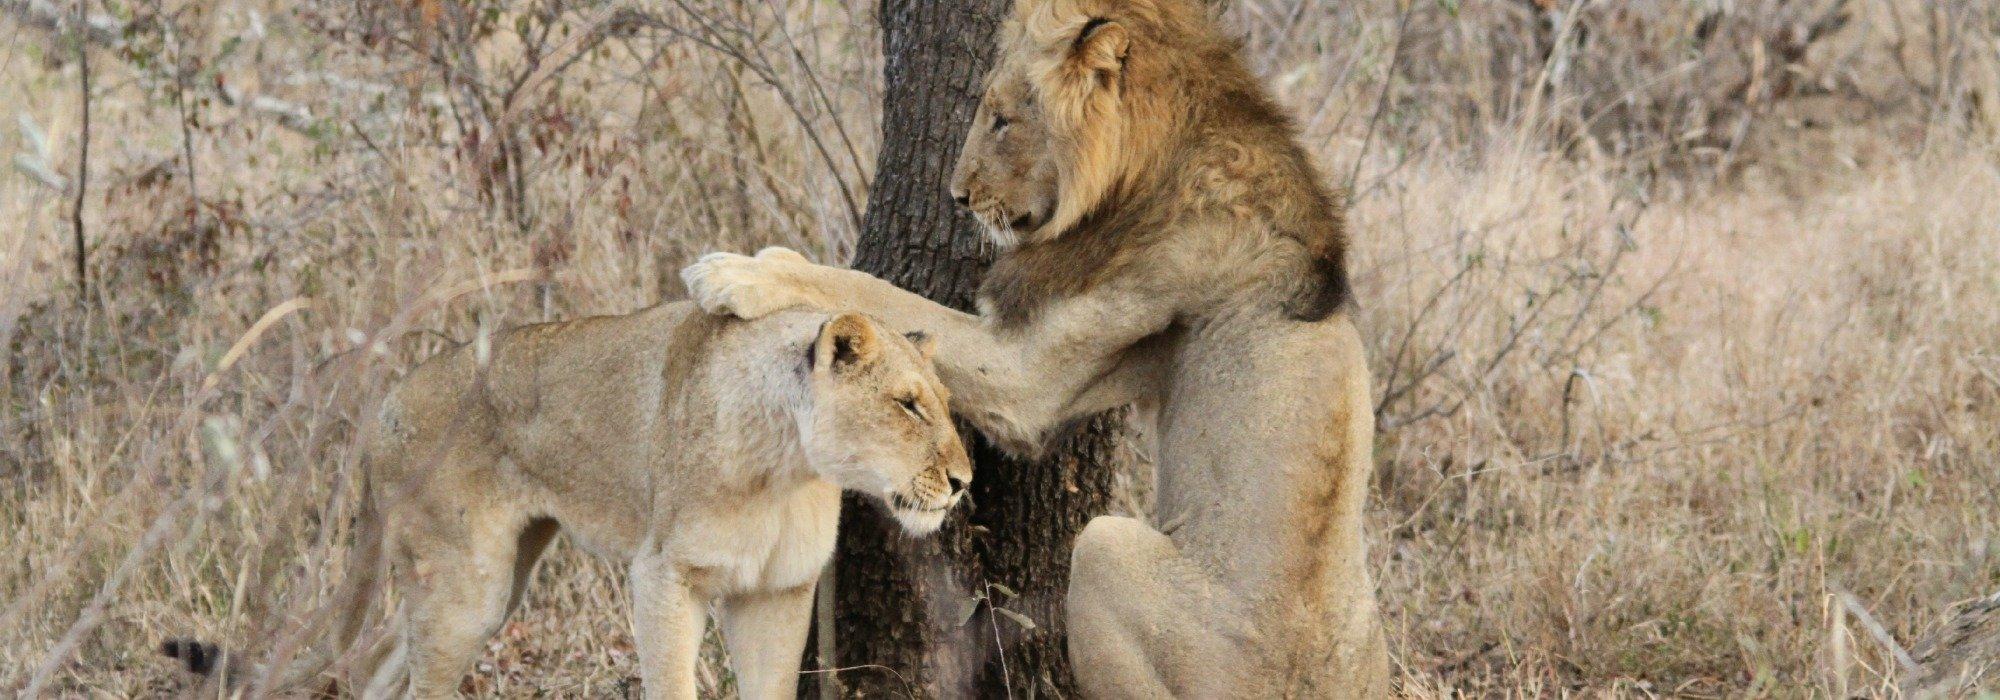 Lion and Lioness on Safari